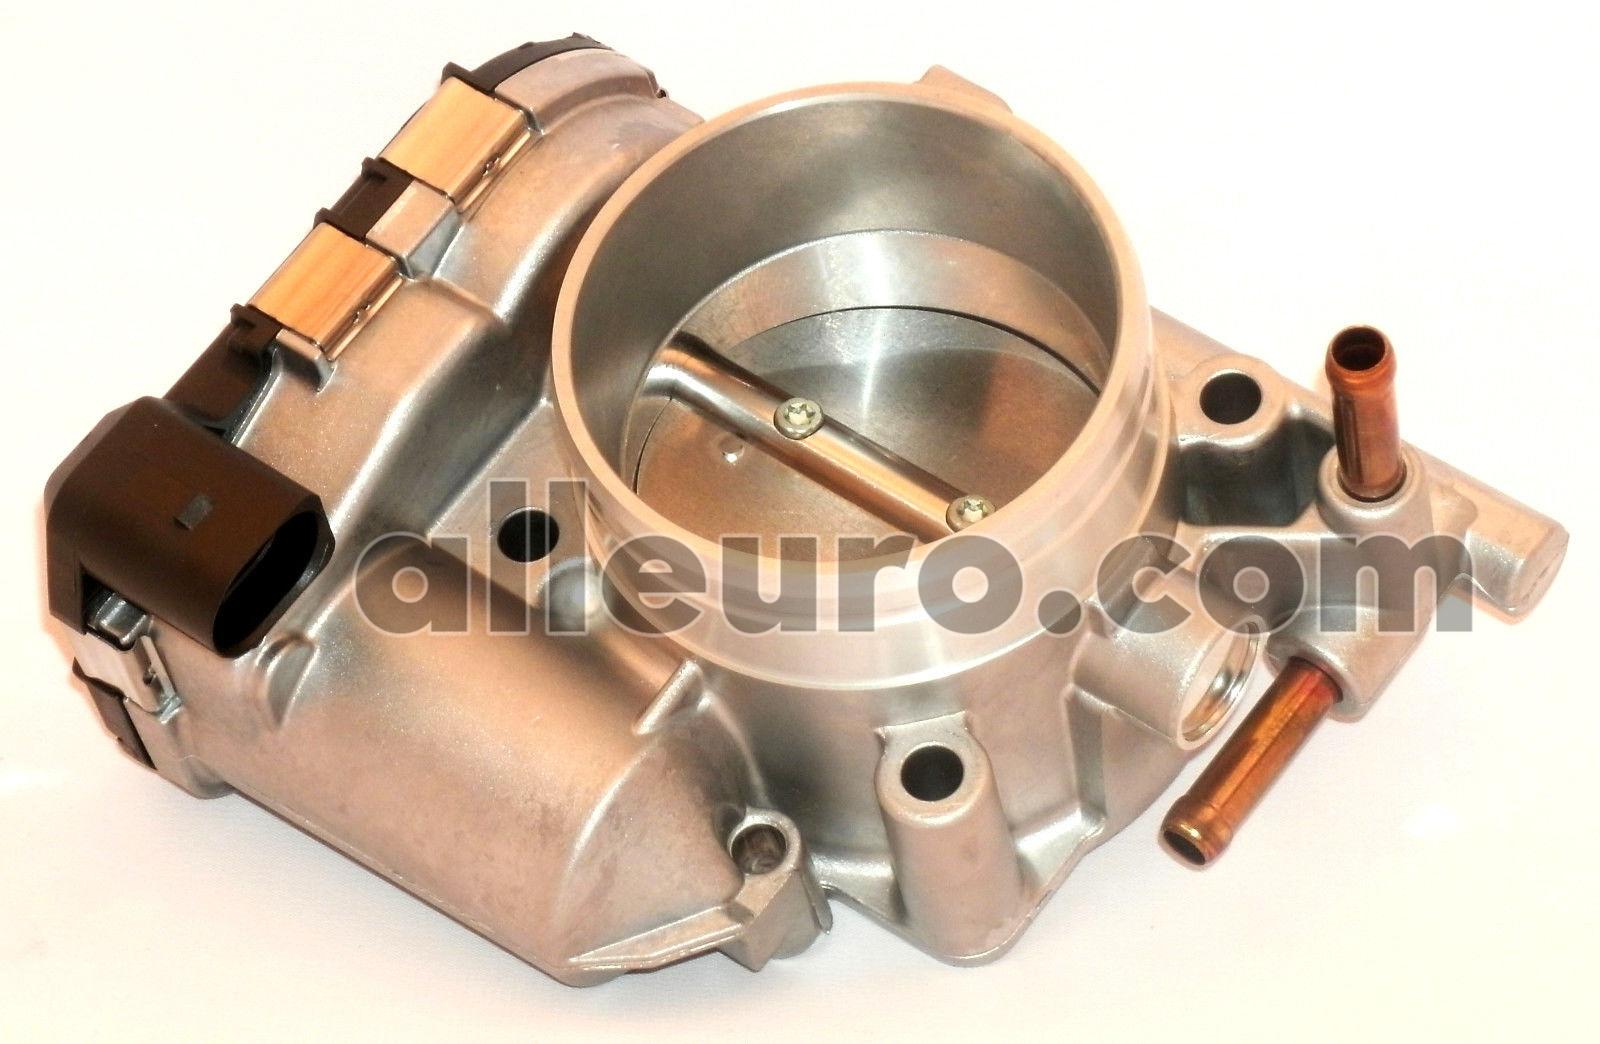 alleuro com: Bosch Throttle Body / Actuator & Parts For